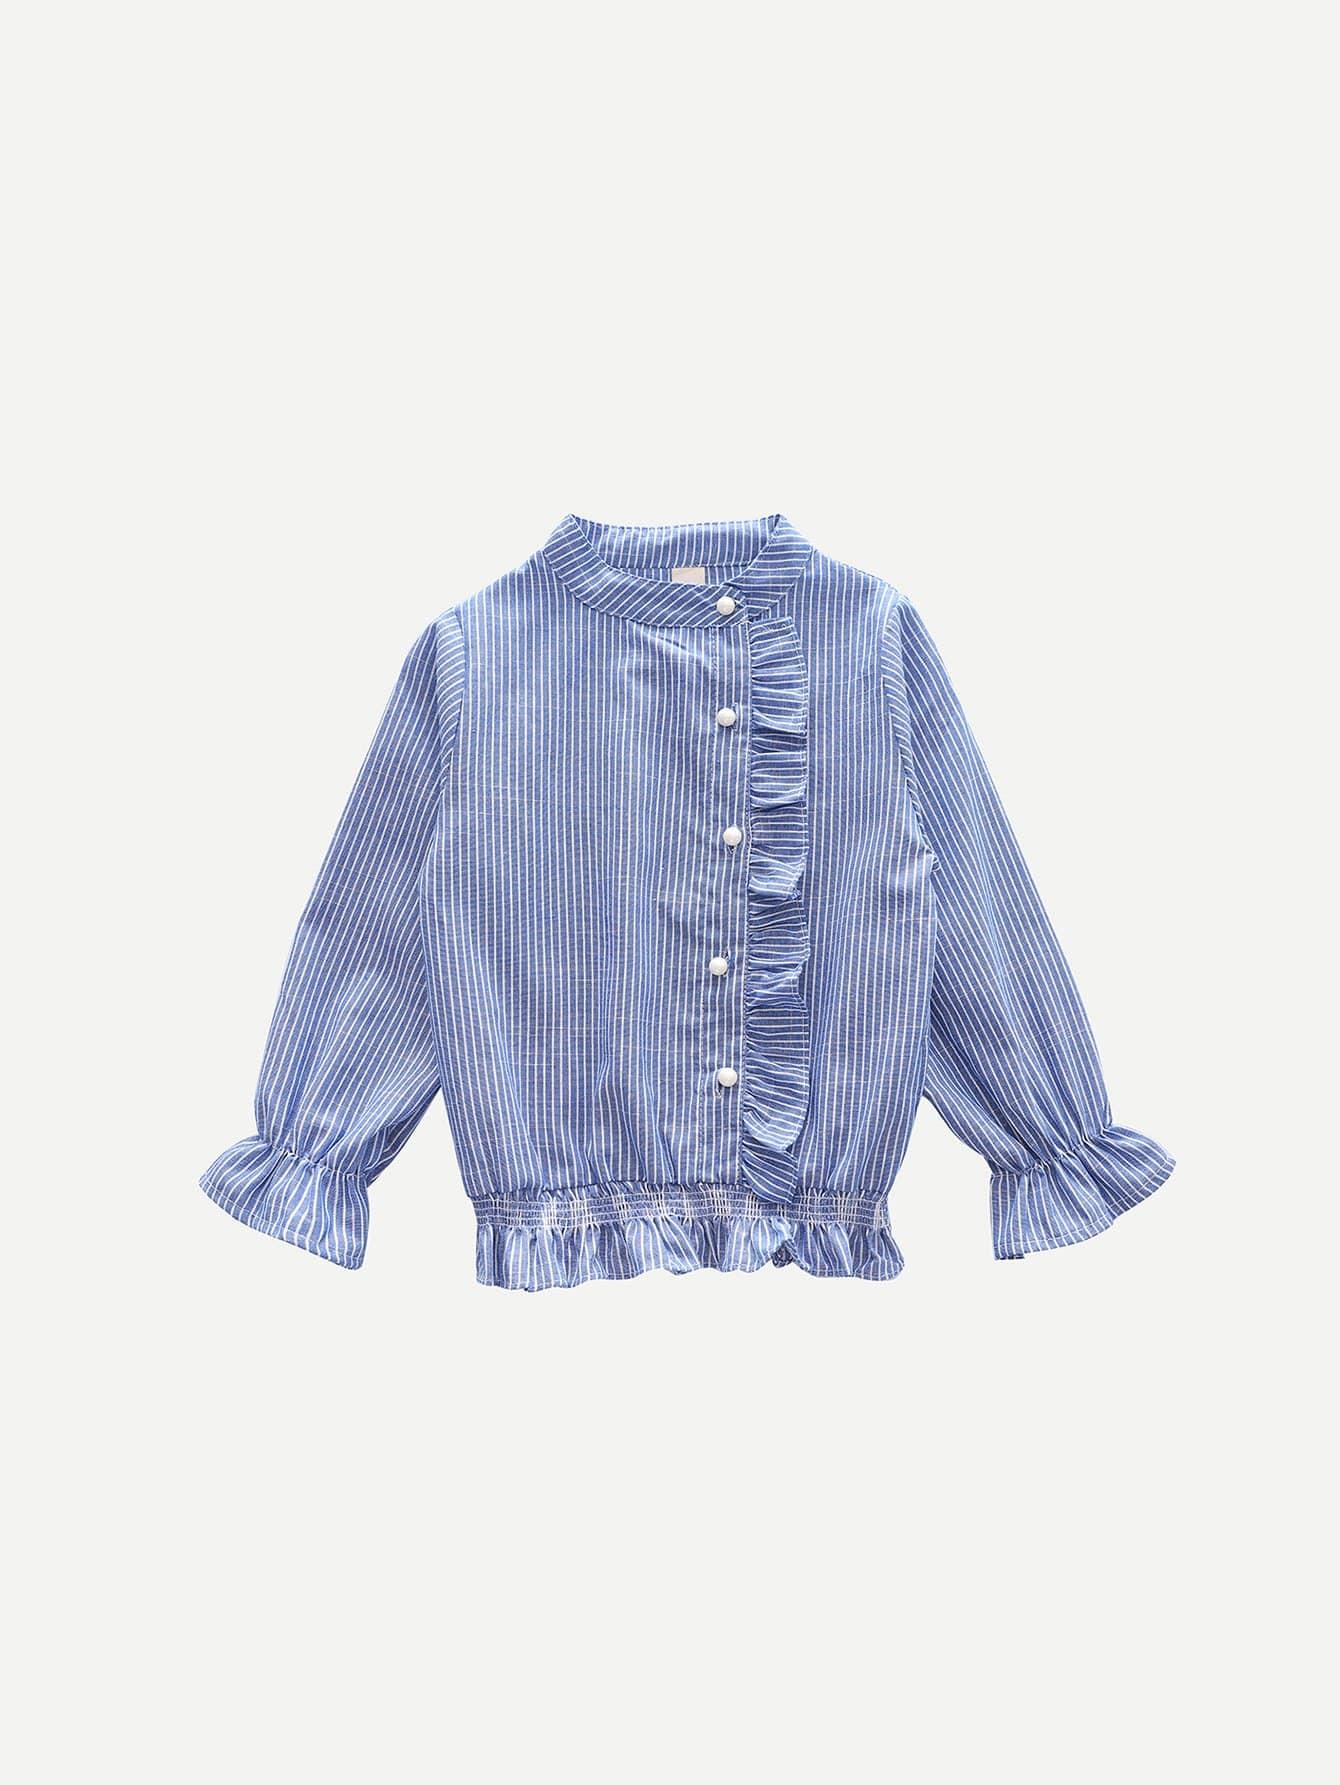 Девушки Рюшами Блуза В Полоску